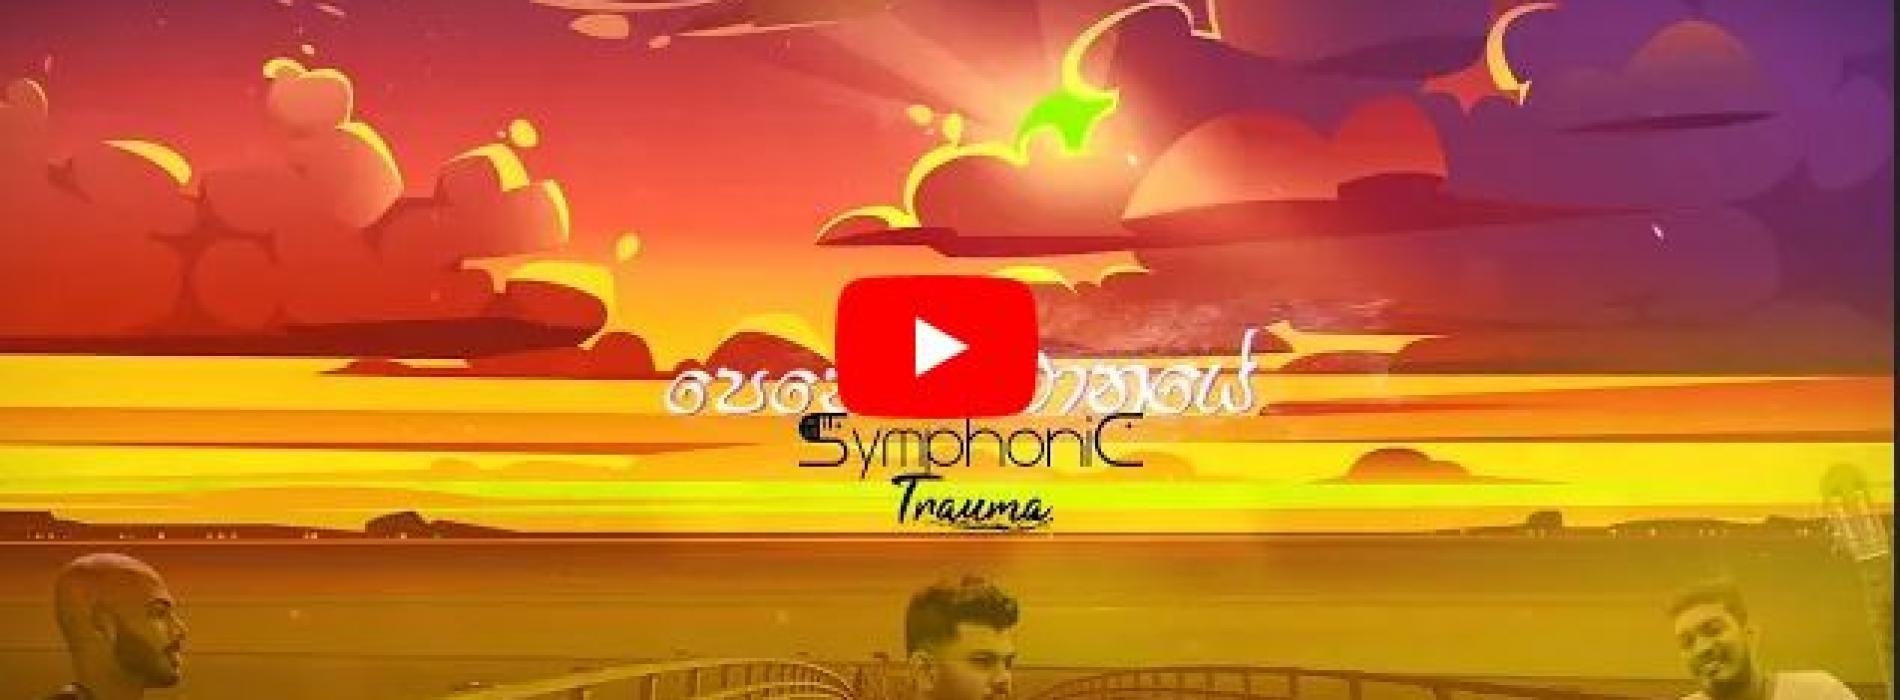 New Music : Randy | Omesh | Hasith – Penena Maanaye (පෙනෙනා මානයේ ) Symphonic Trauma